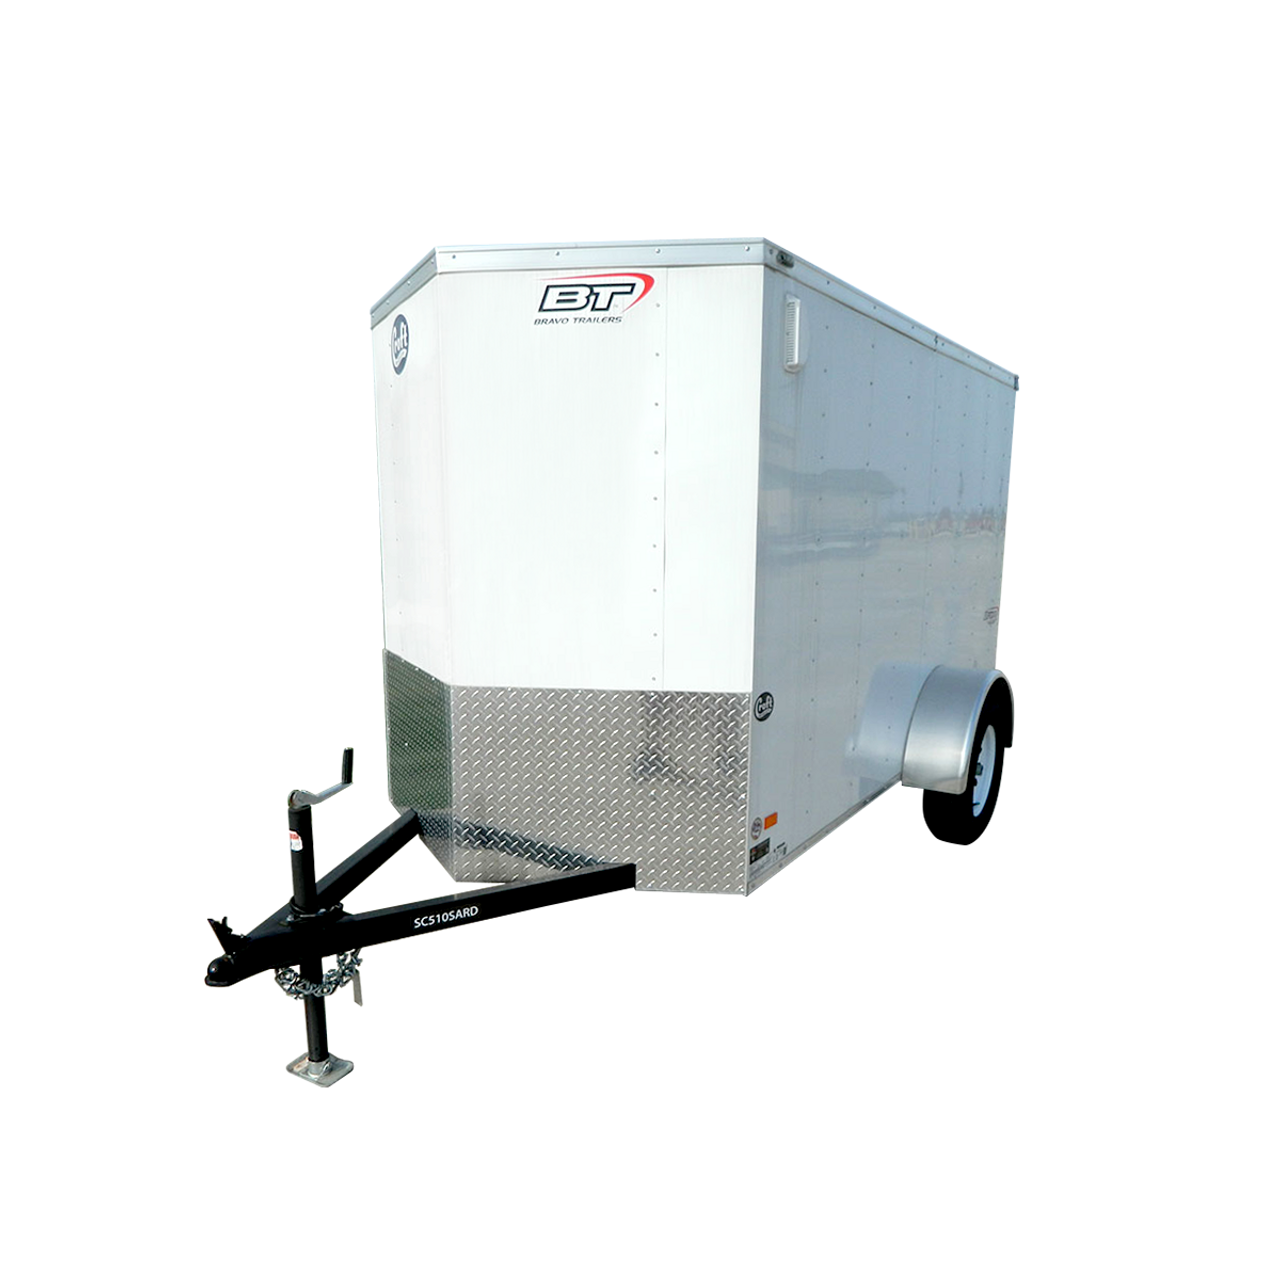 SC510SARD --- 5' X 10' Enclosed Trailer with Ramp Door - Bravo